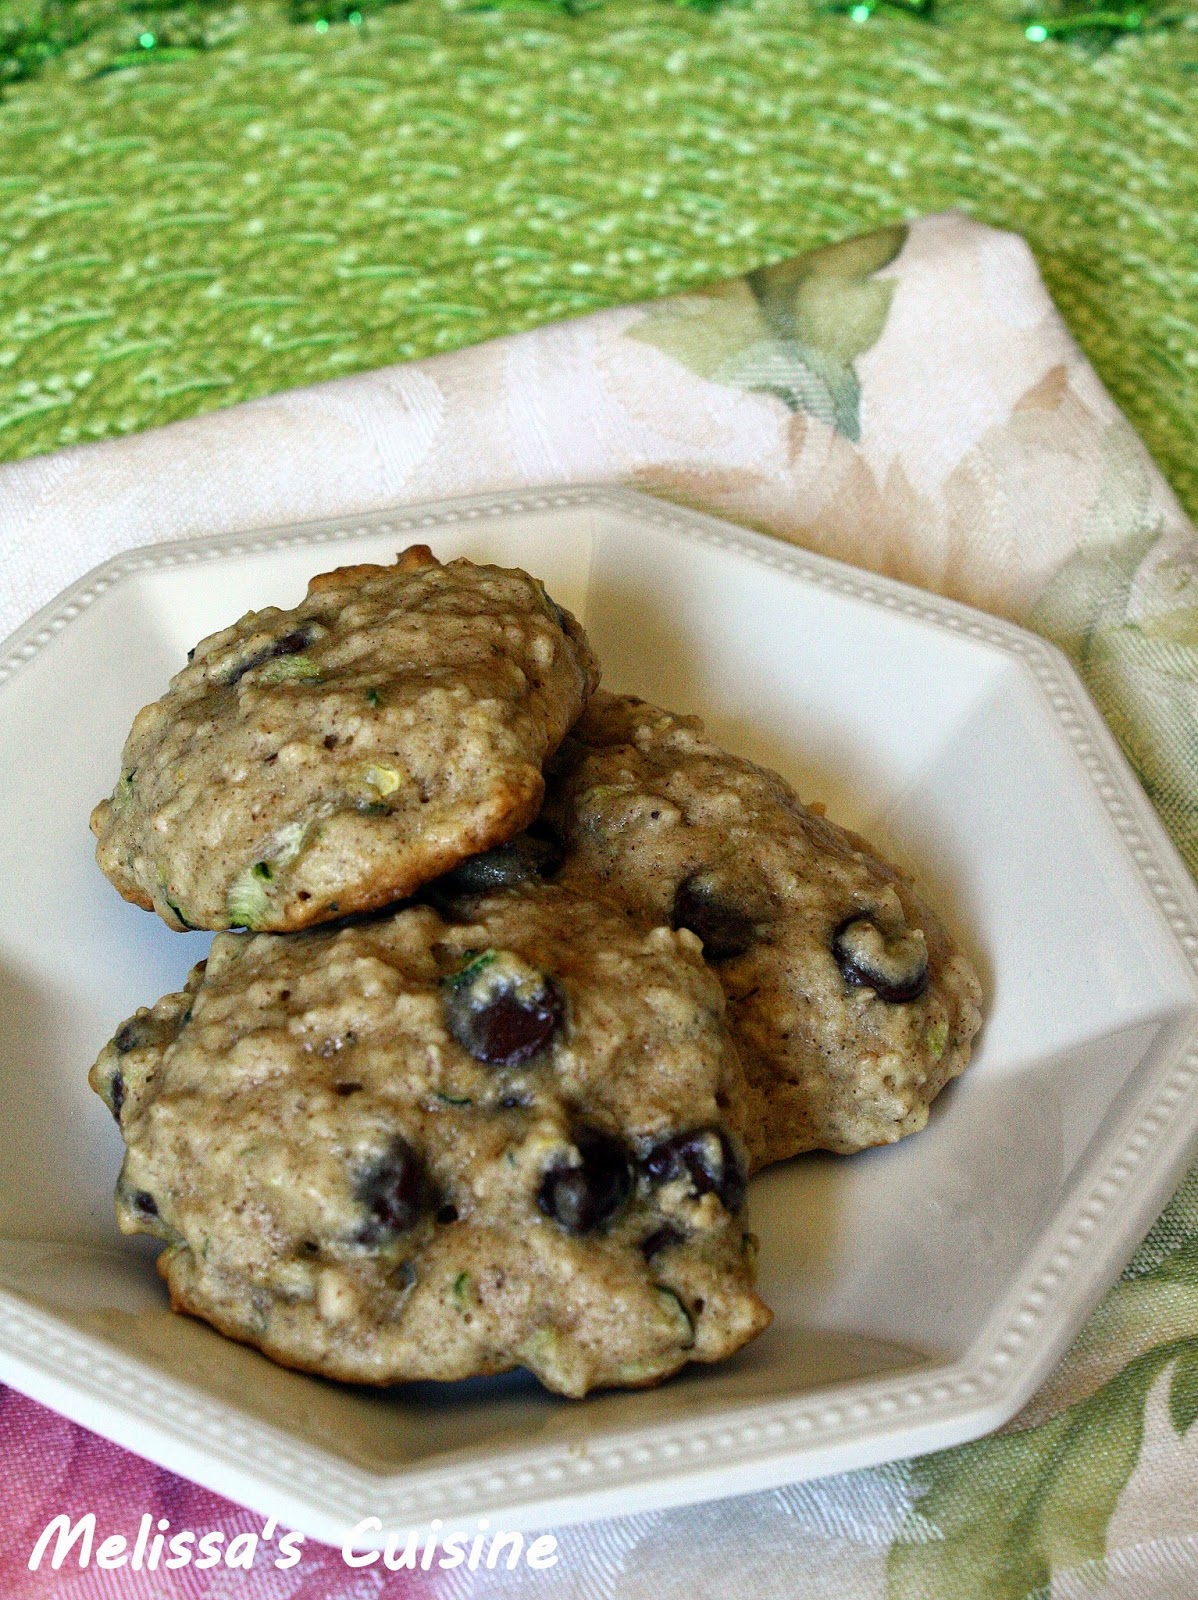 Melissa's Cuisine: Zucchini Chocolate Chip Cookies